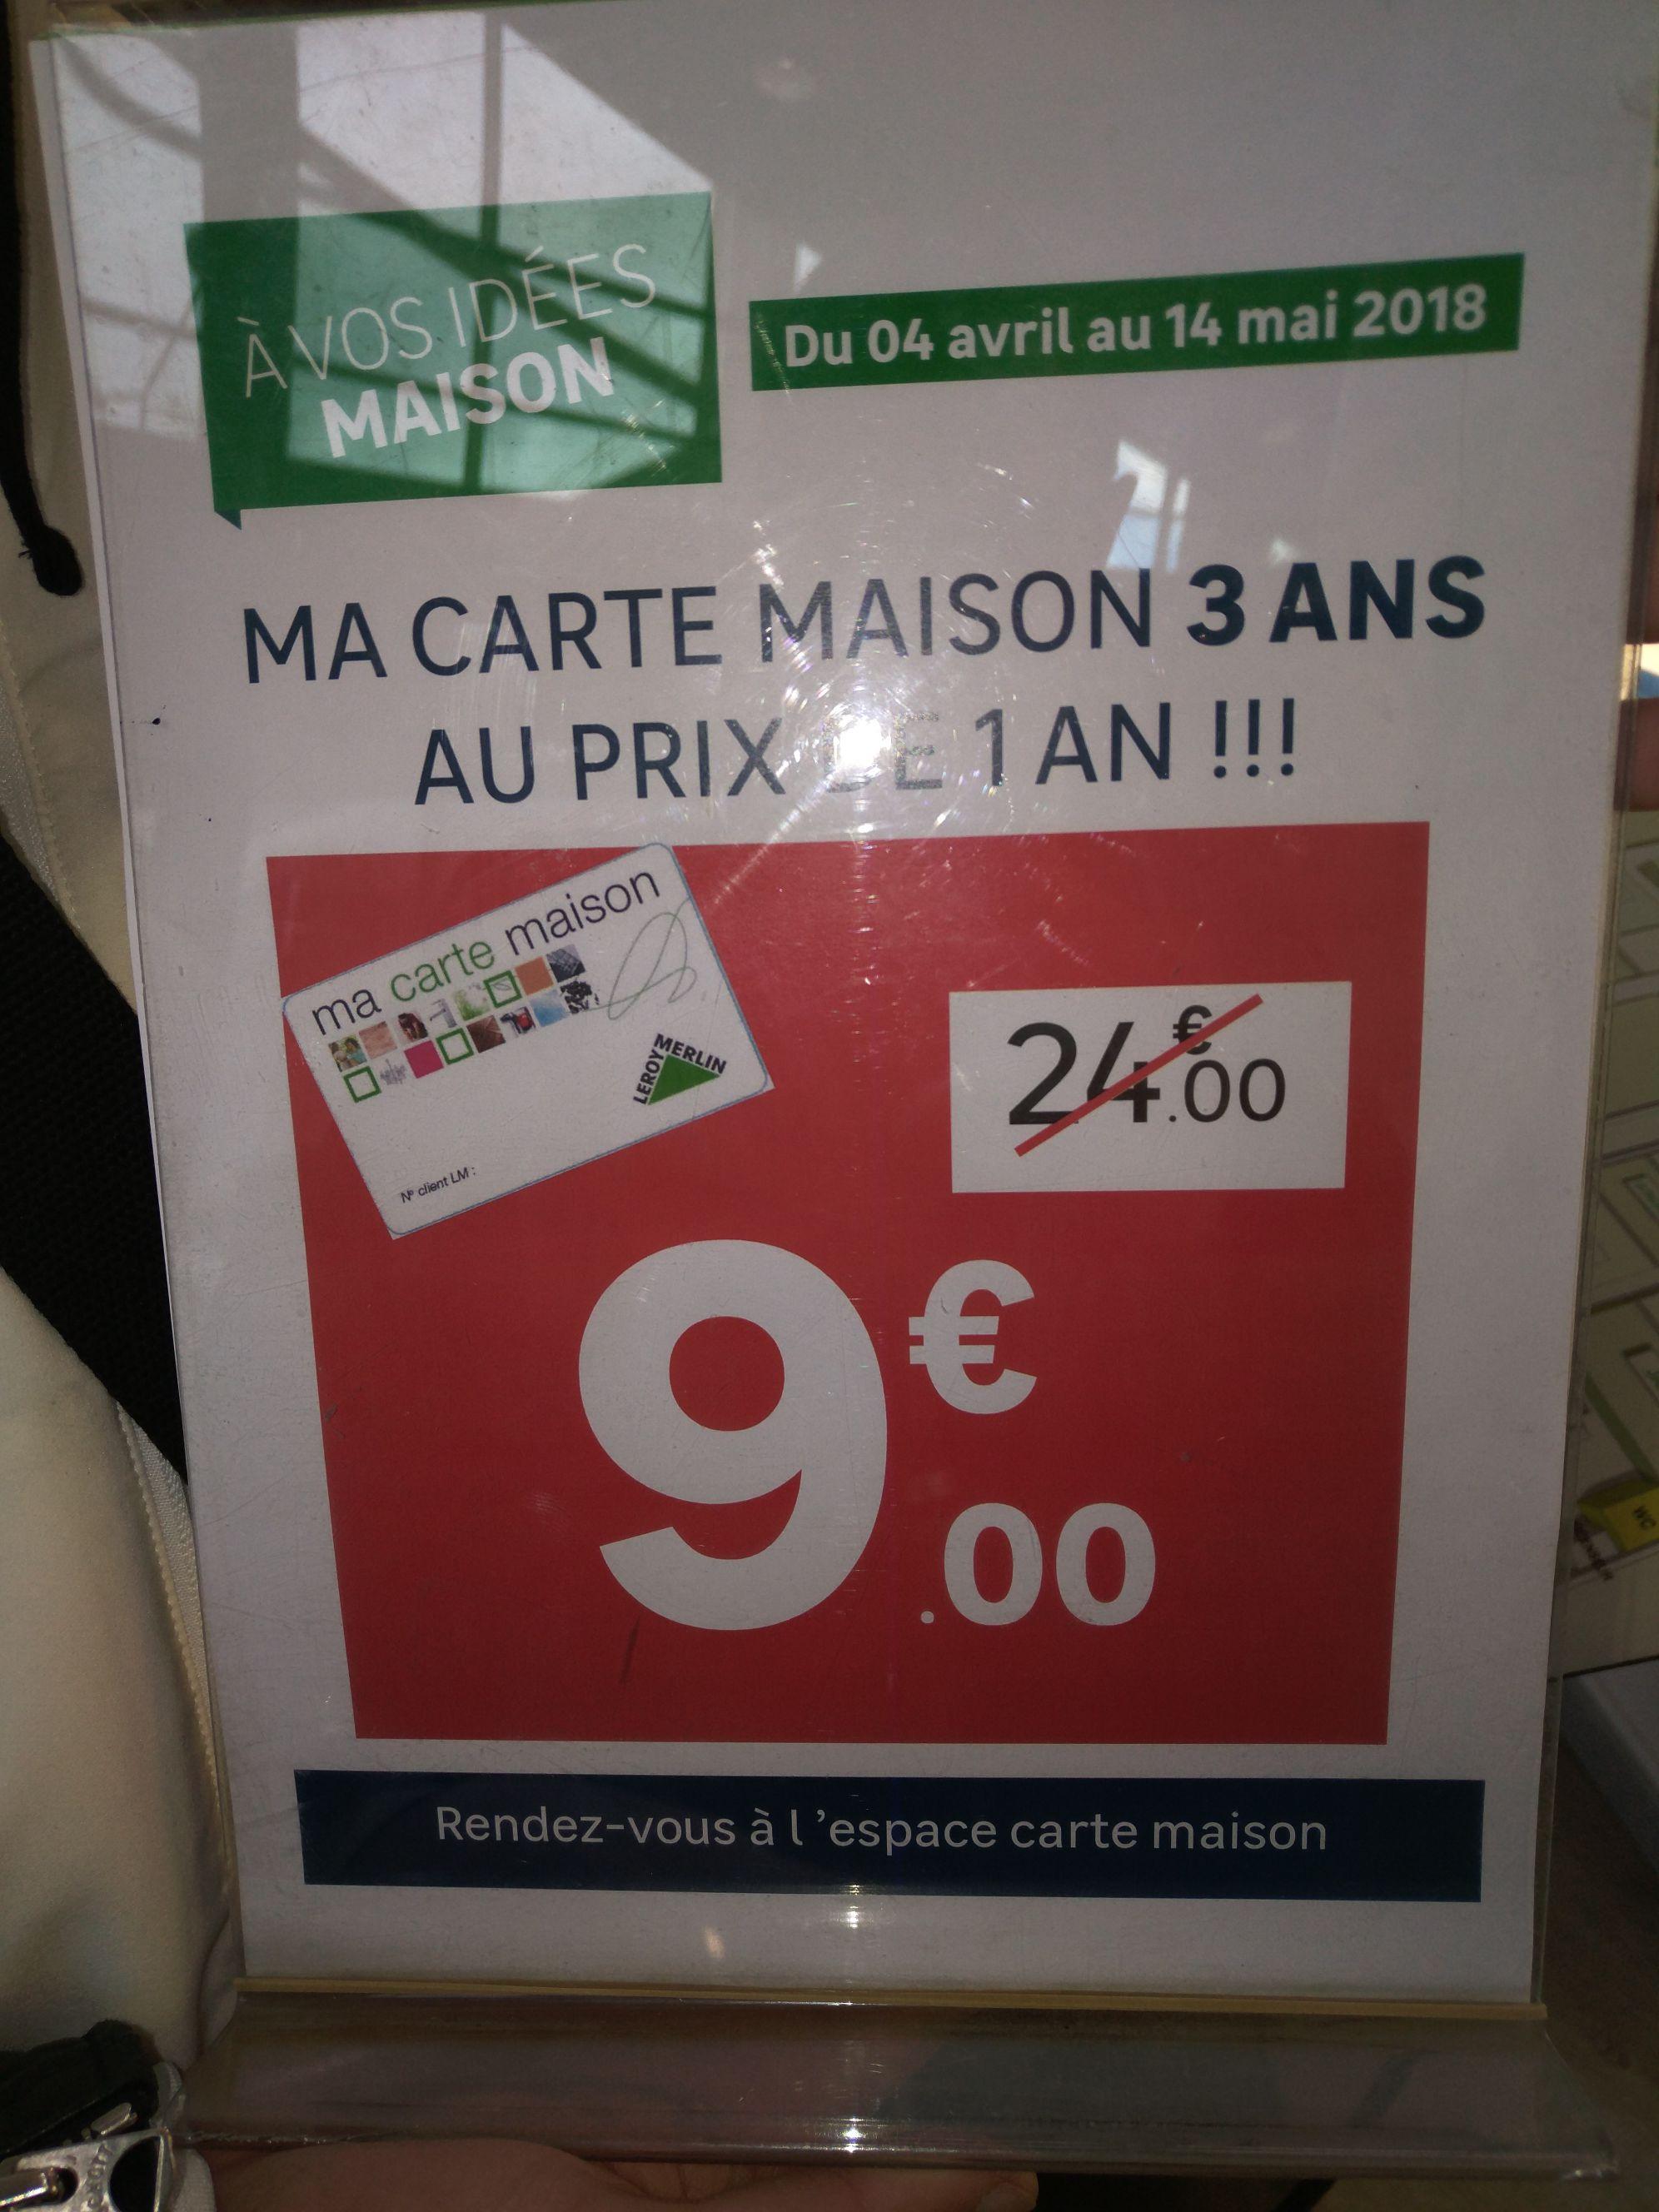 Carte Maison 3 ans - Leroy Merlin Saint Denis- Stade de France (93)